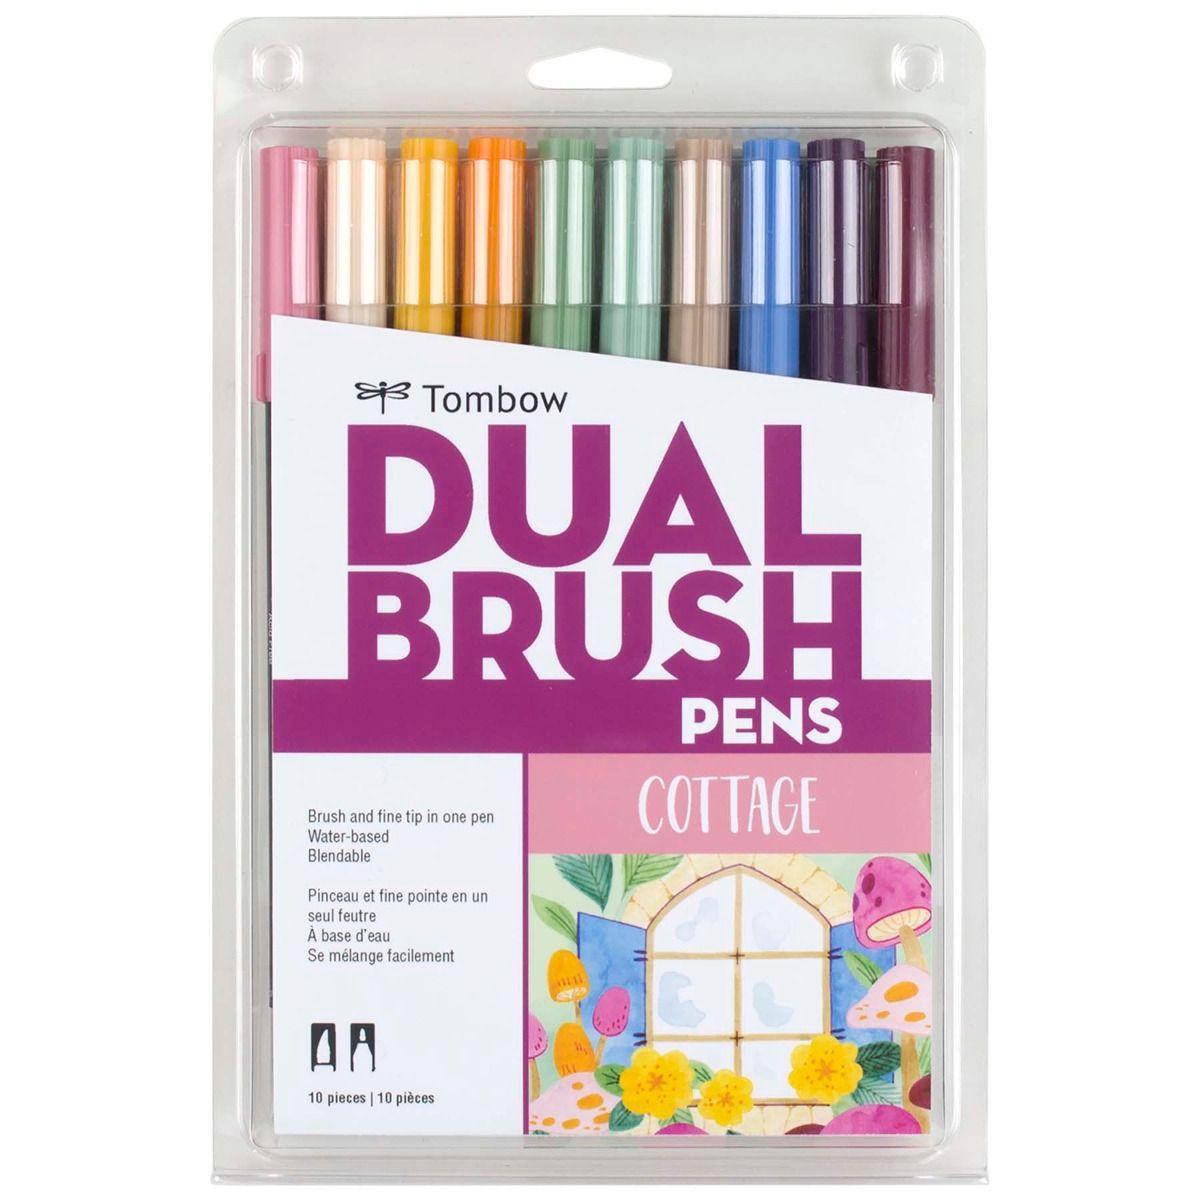 Tombow - Dual Brush Pen, Cottage